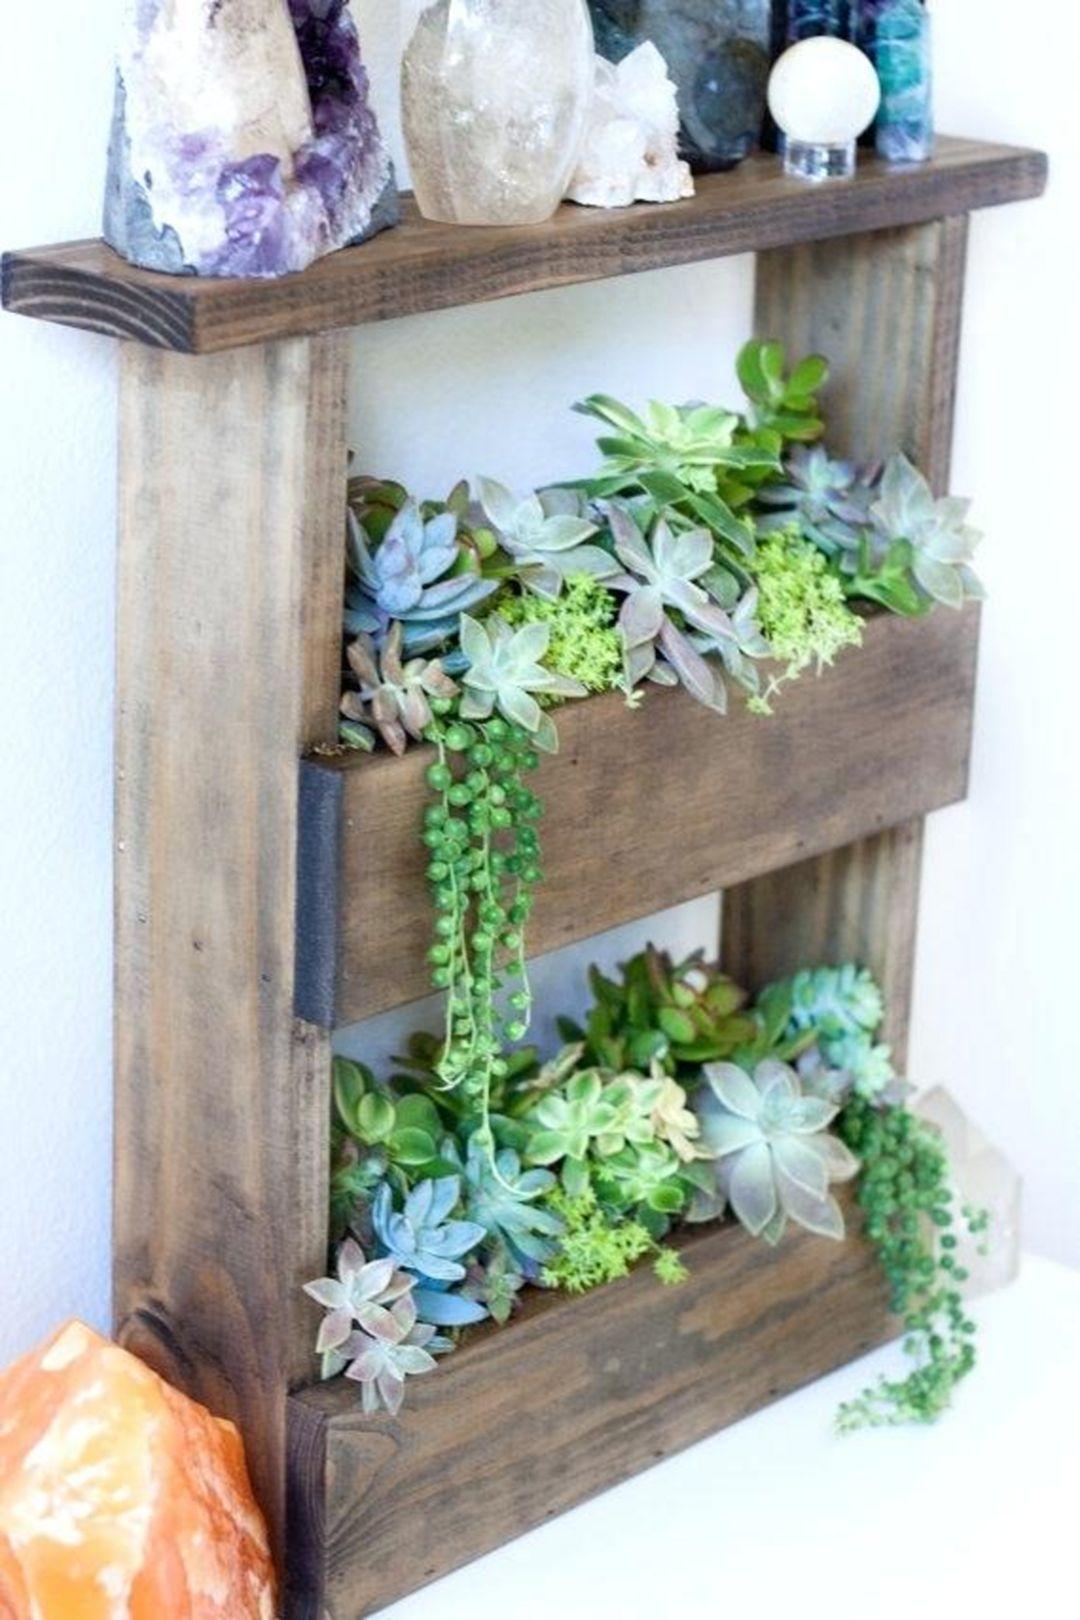 15 enchanting diy plants shelf ideas for home decoration